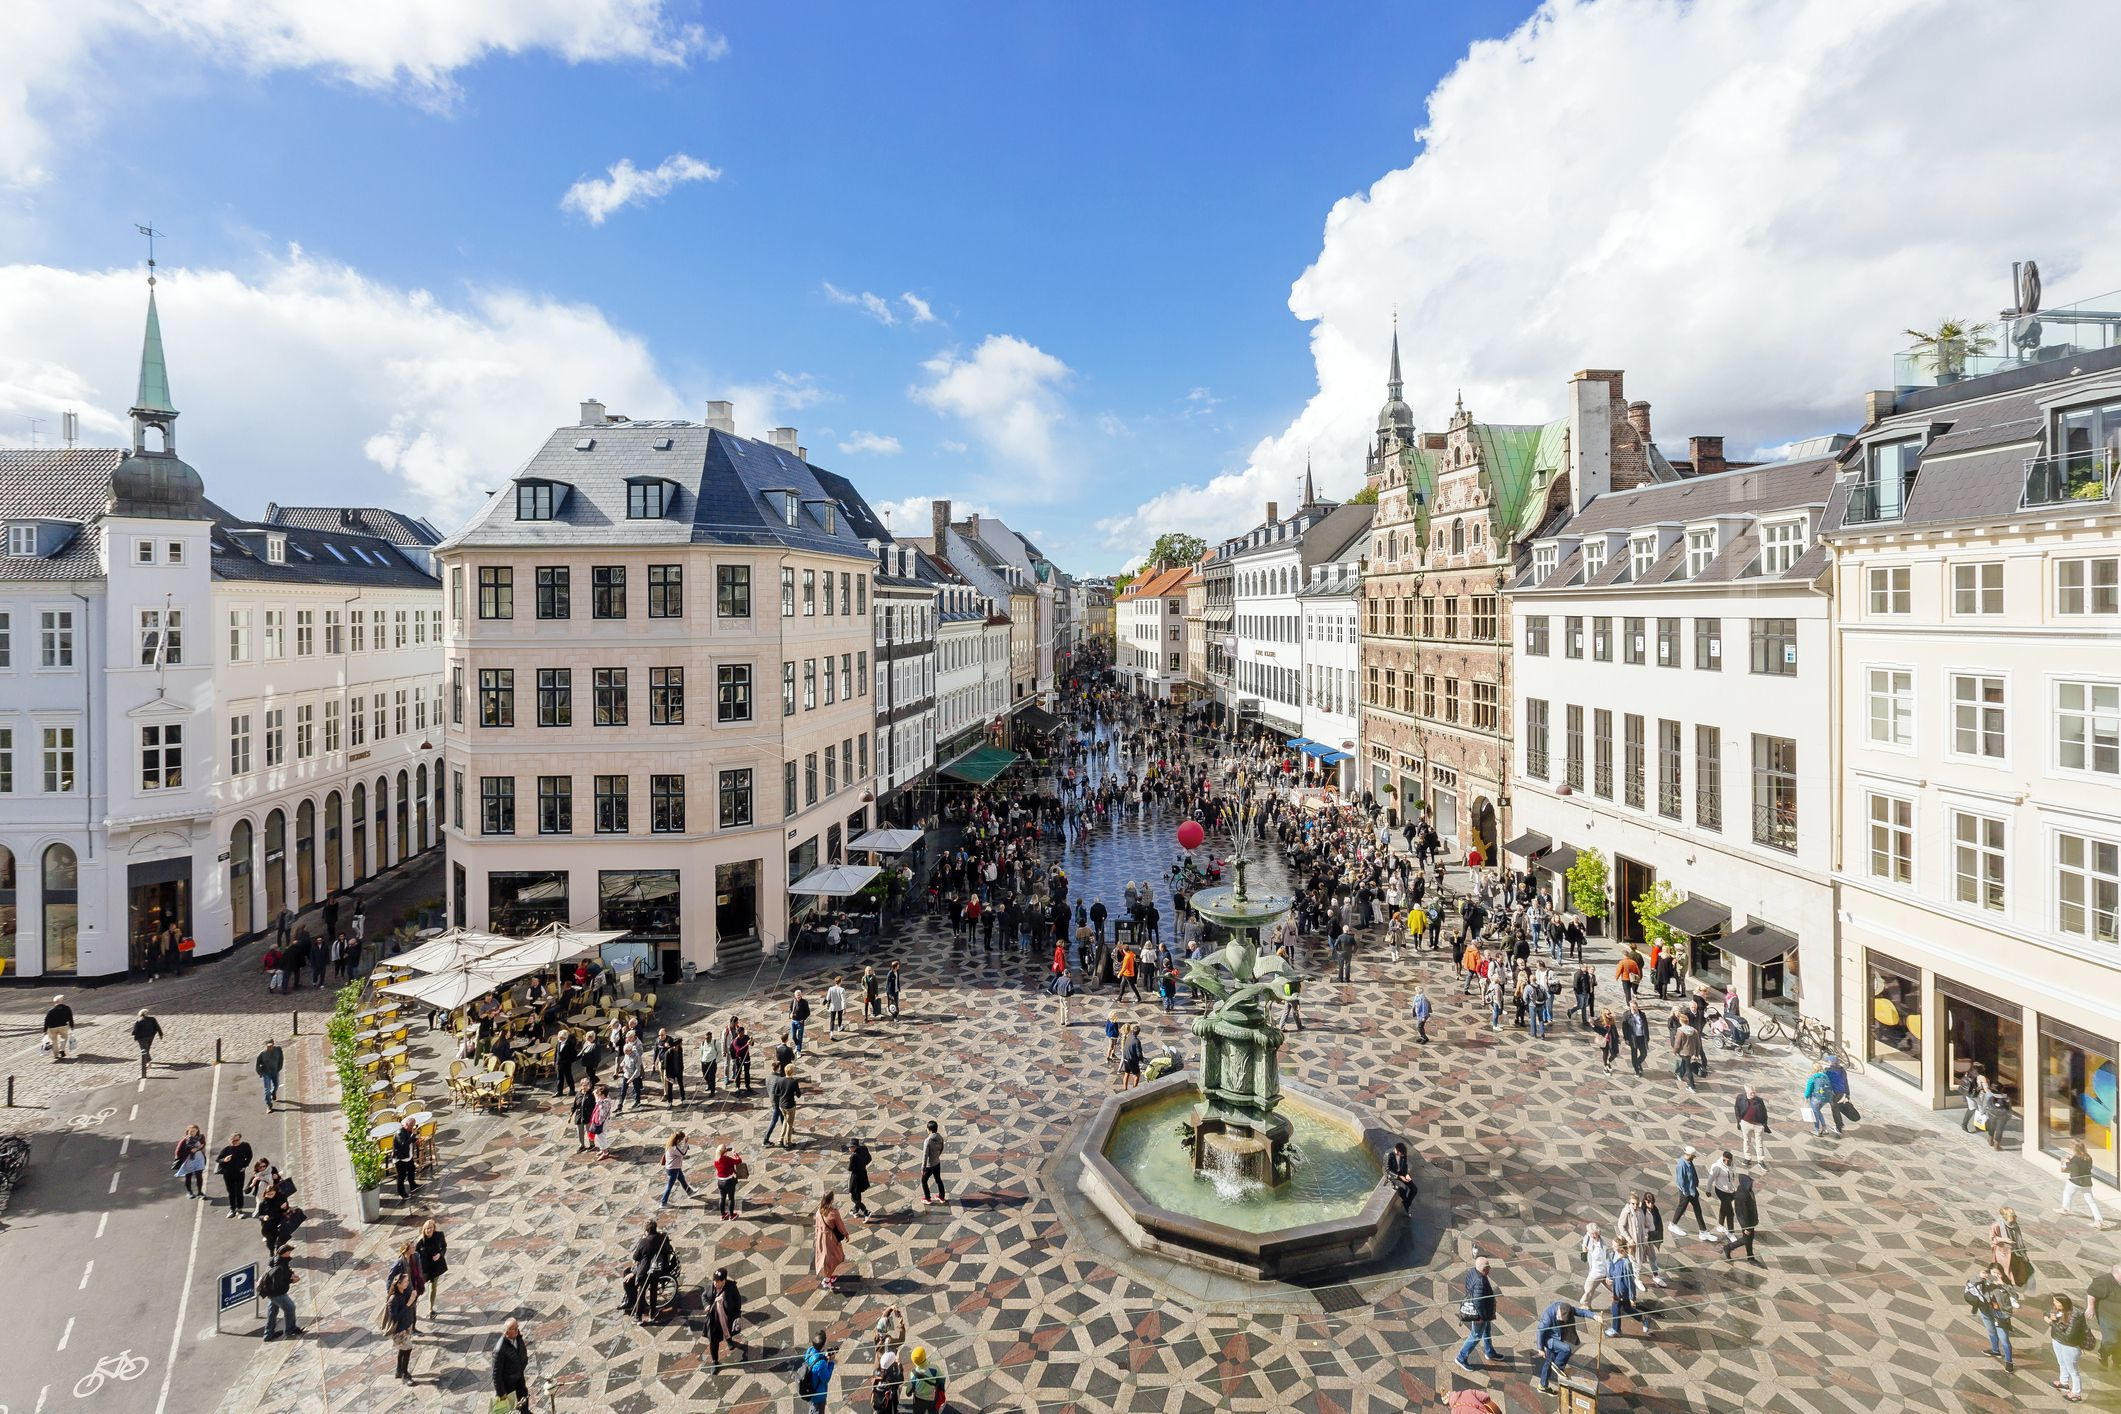 Shoppen In Kopenhagen